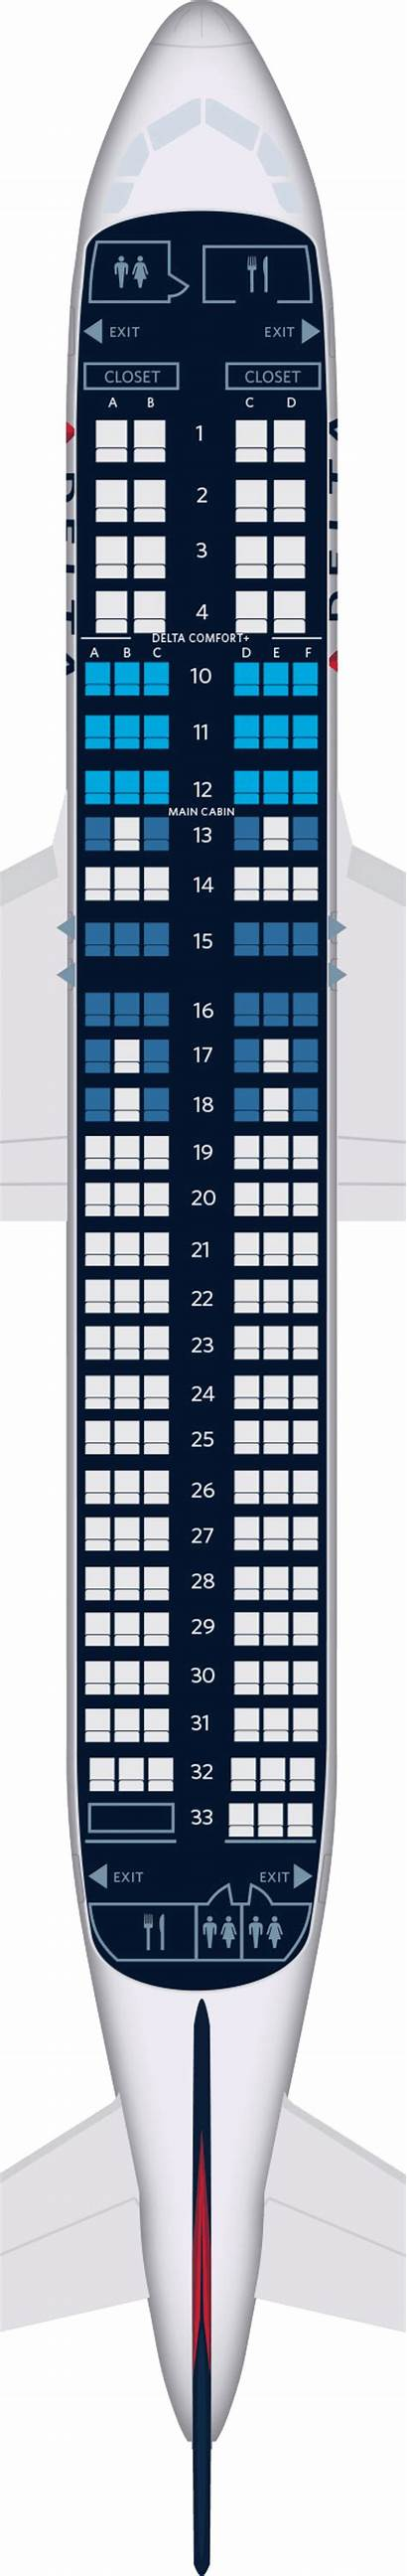 Airbus A320 Aircraft Delta Seat Map 320